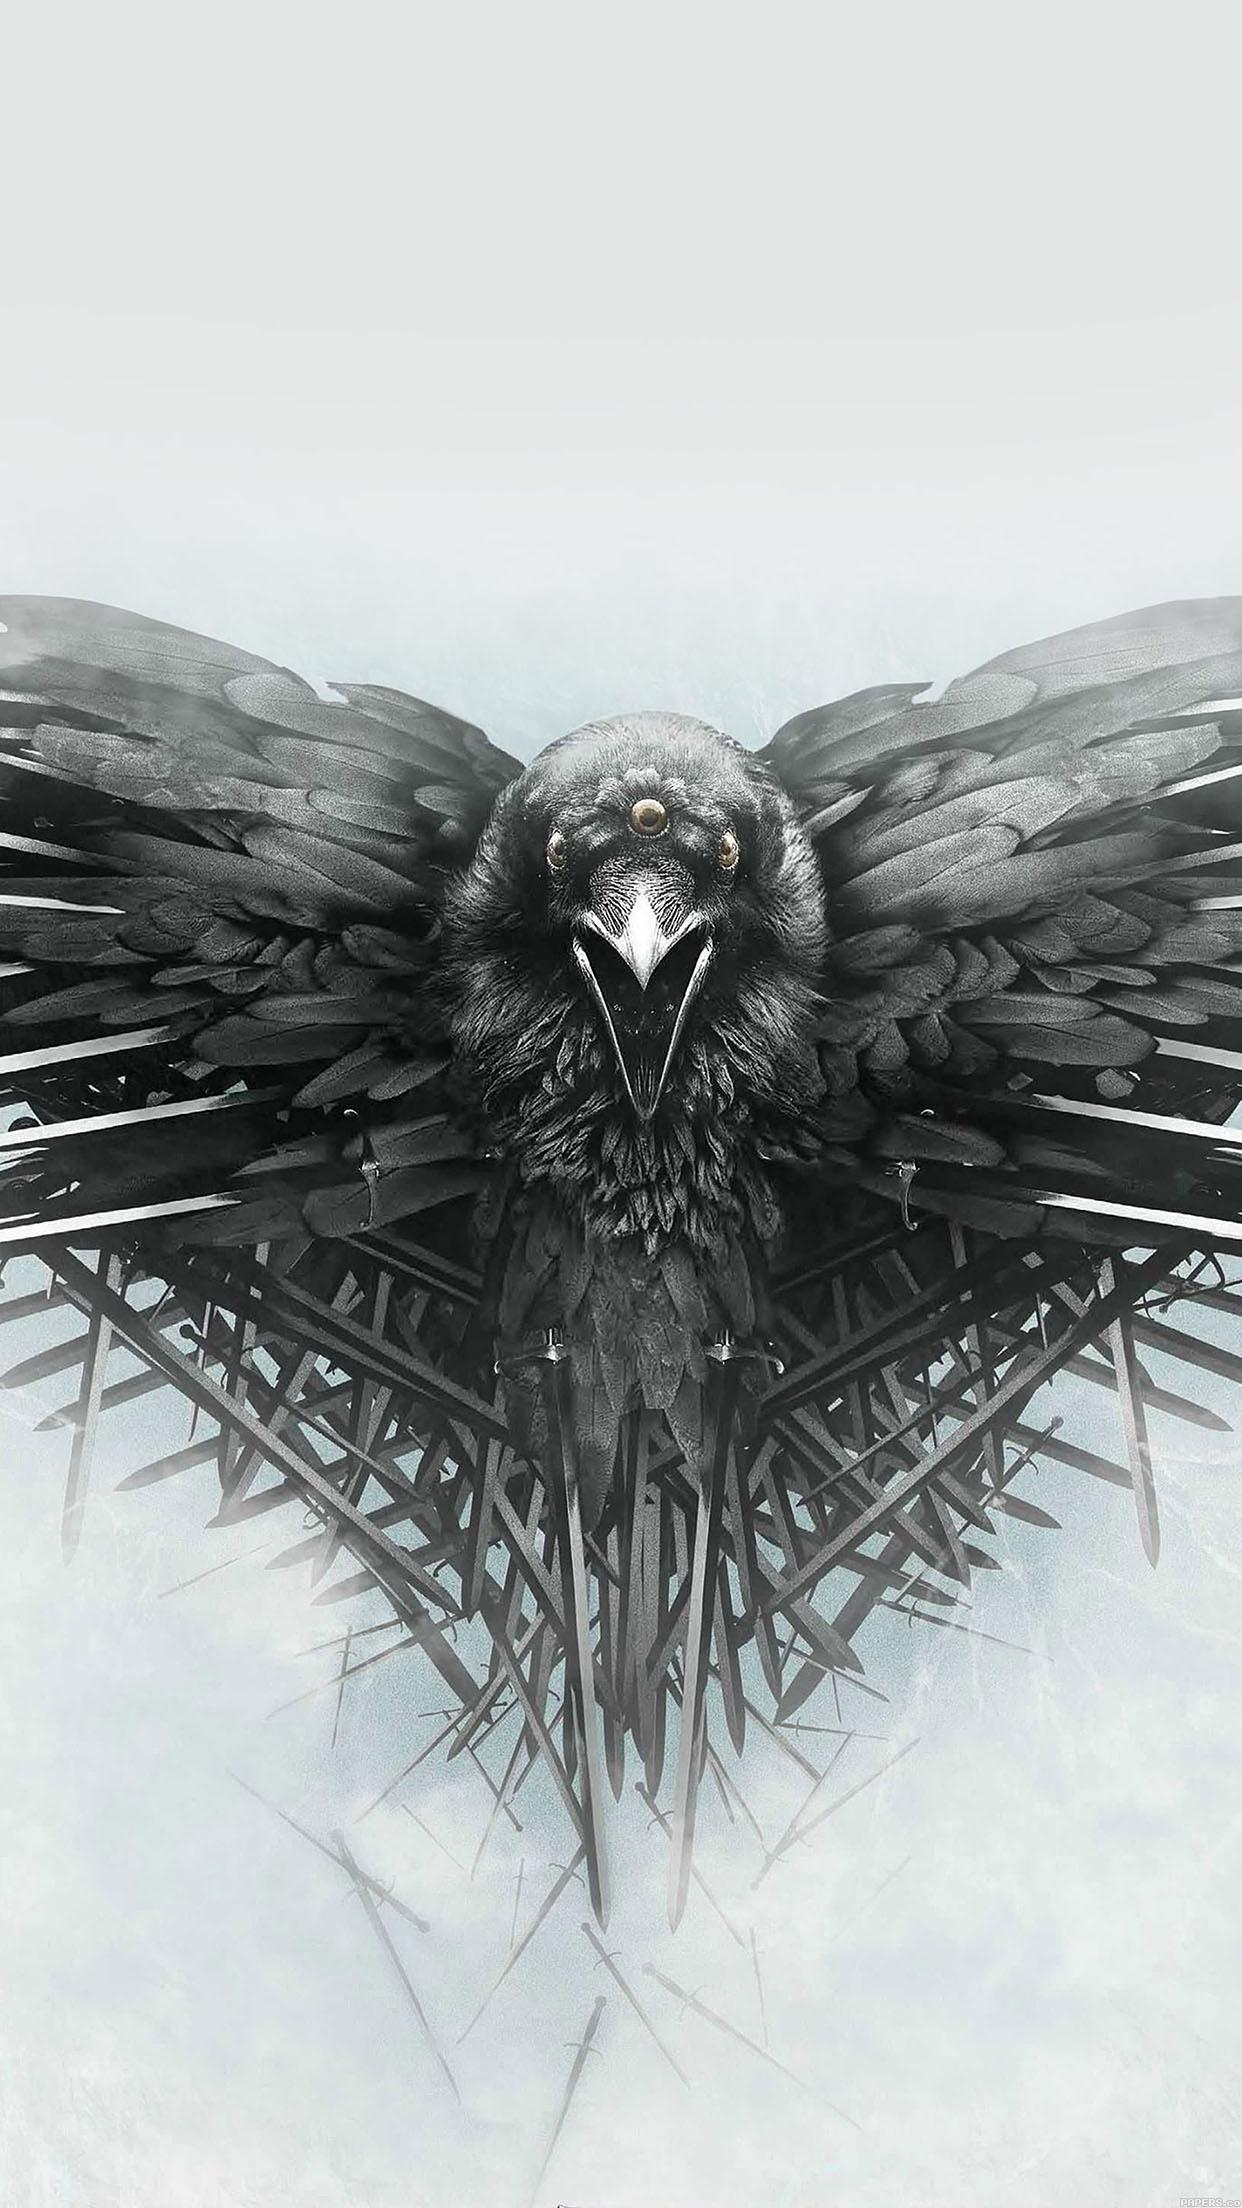 Iphone7papers Ab79 Wallpaper Game Of Thrones All Men Must Die